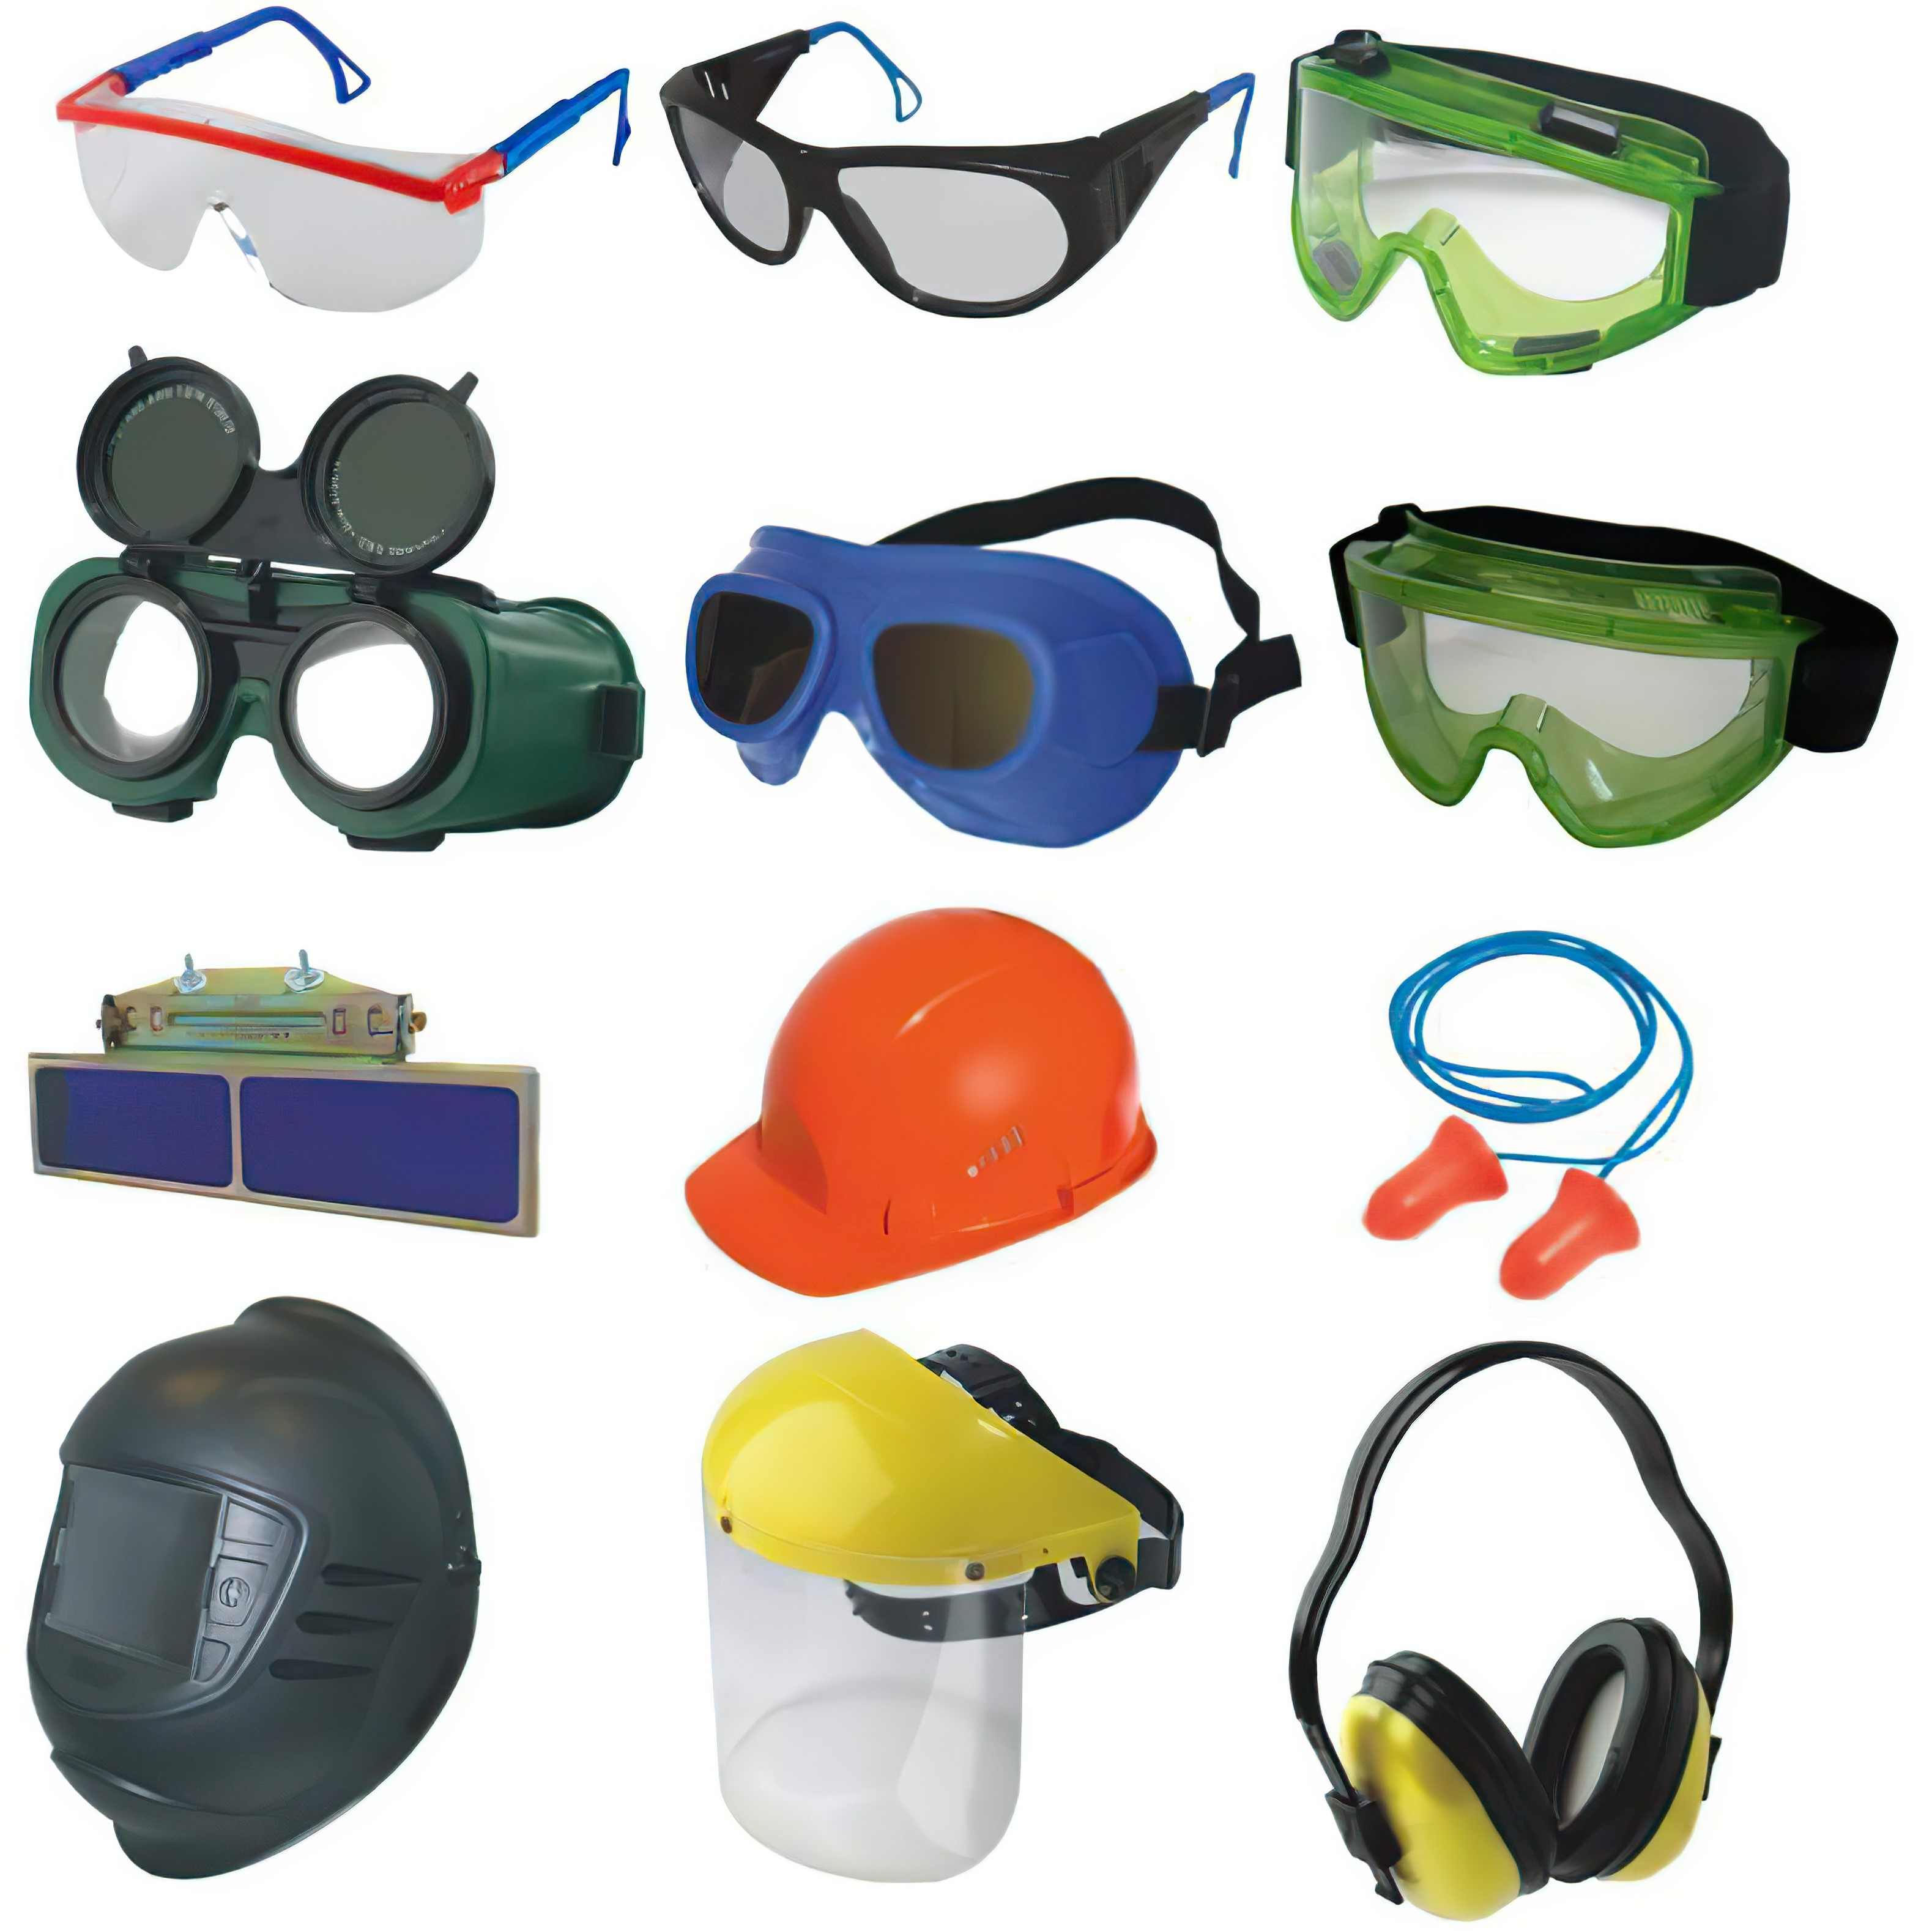 Средства защиты головы, глаз, лица